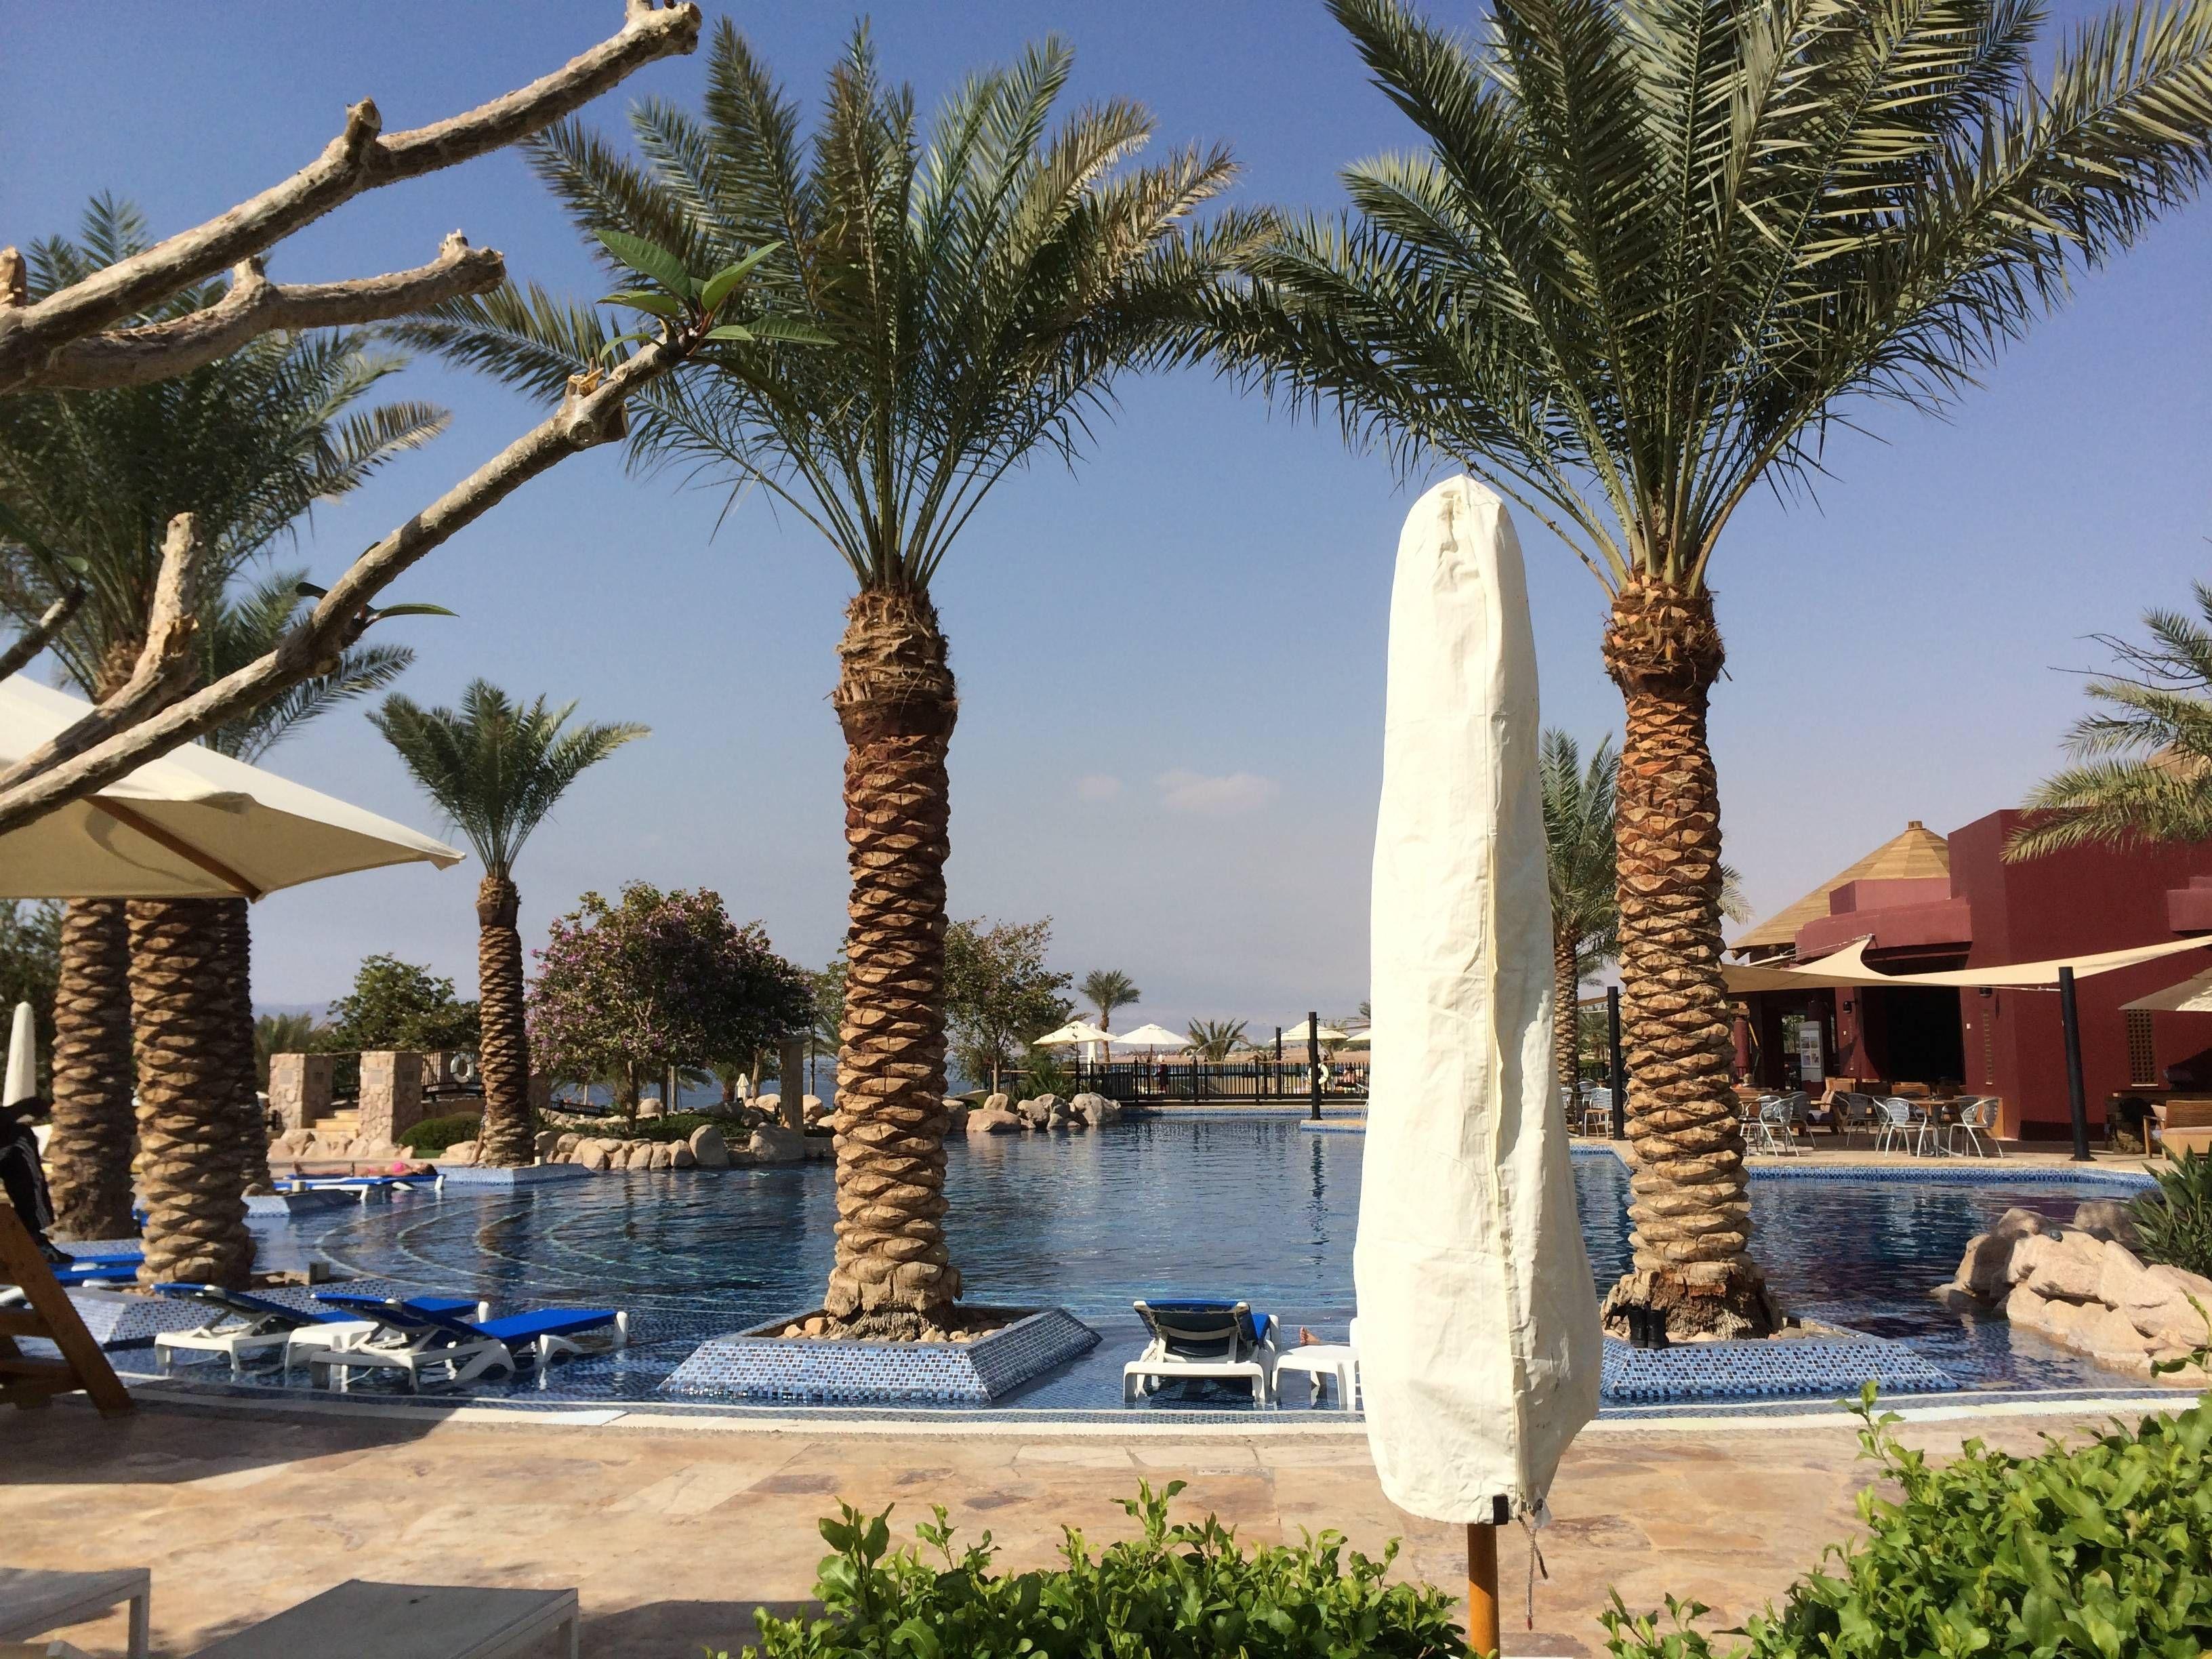 Movenpick Aqaba Tala Bay